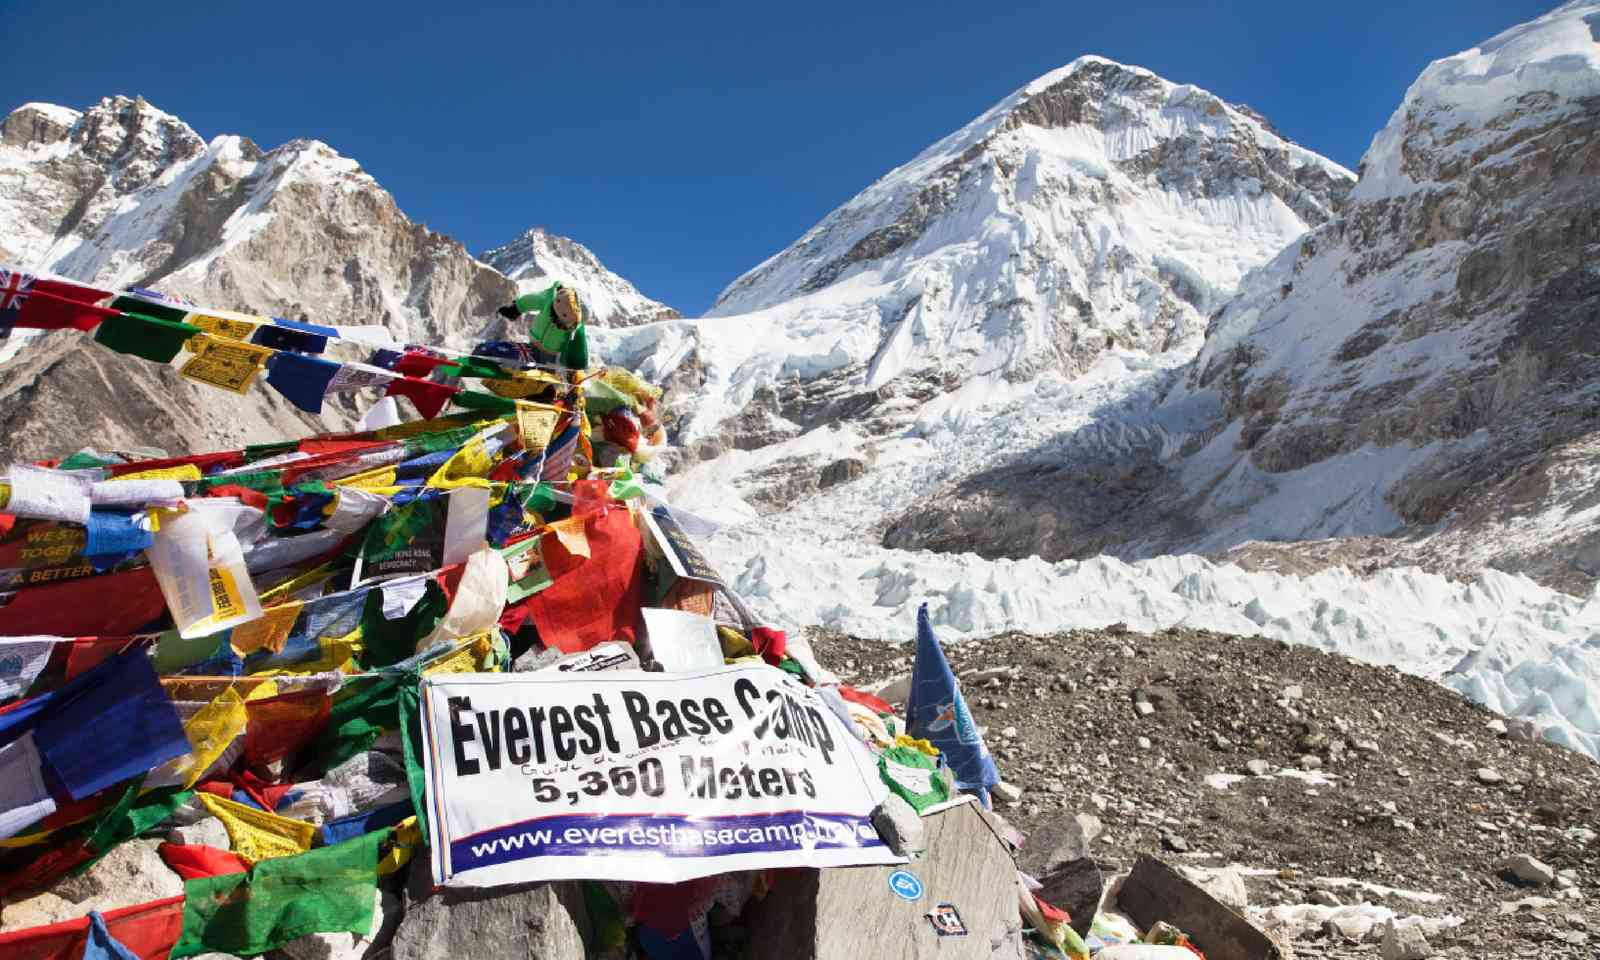 Everest Base Camp, Nepal (Shutterstock)